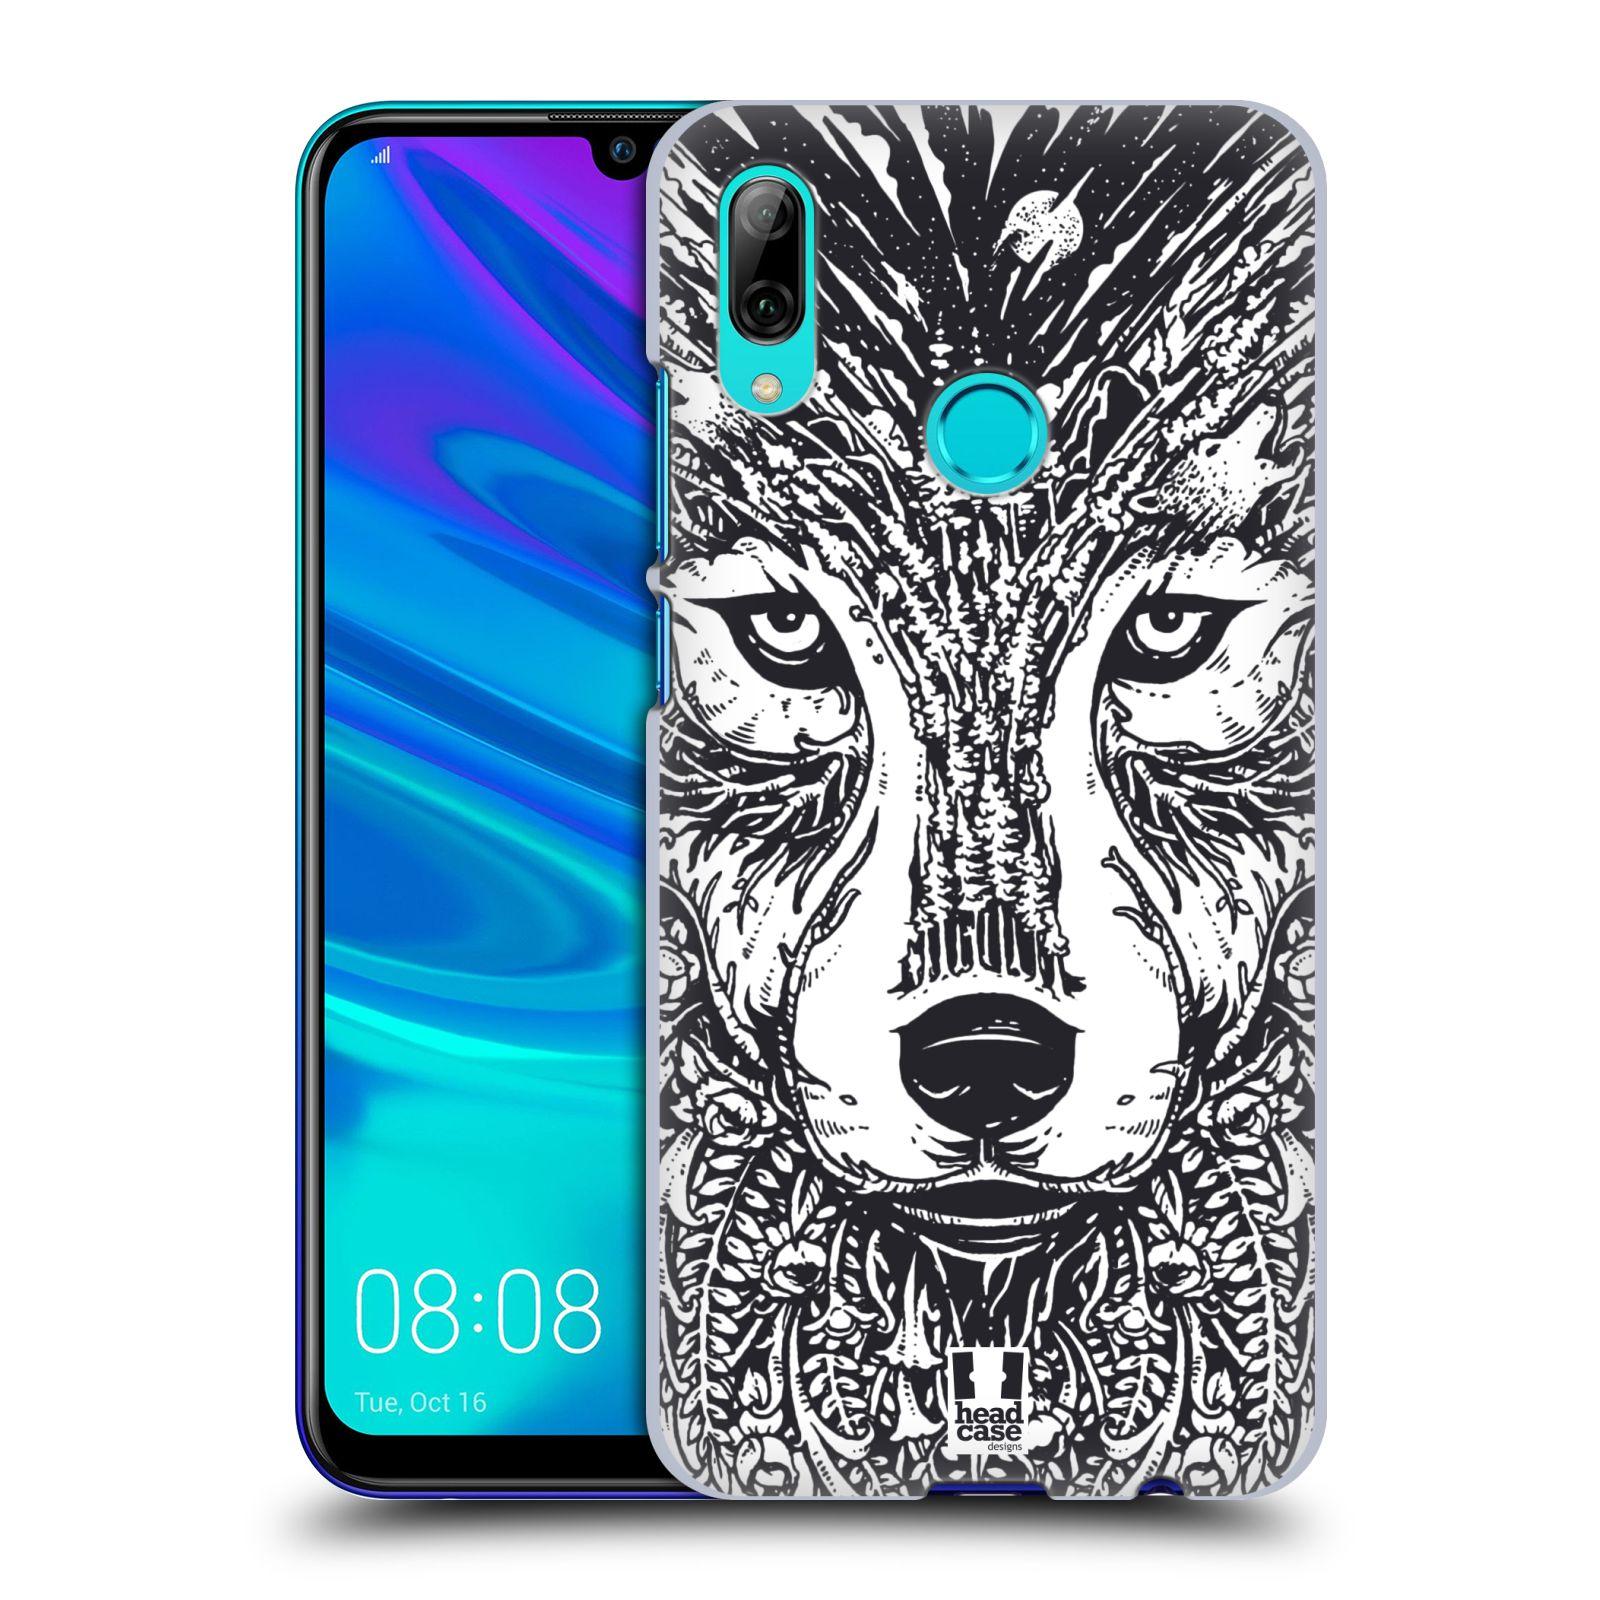 Plastové pouzdro na mobil Honor 10 Lite - Head Case - DOODLE TVÁŘ VLK